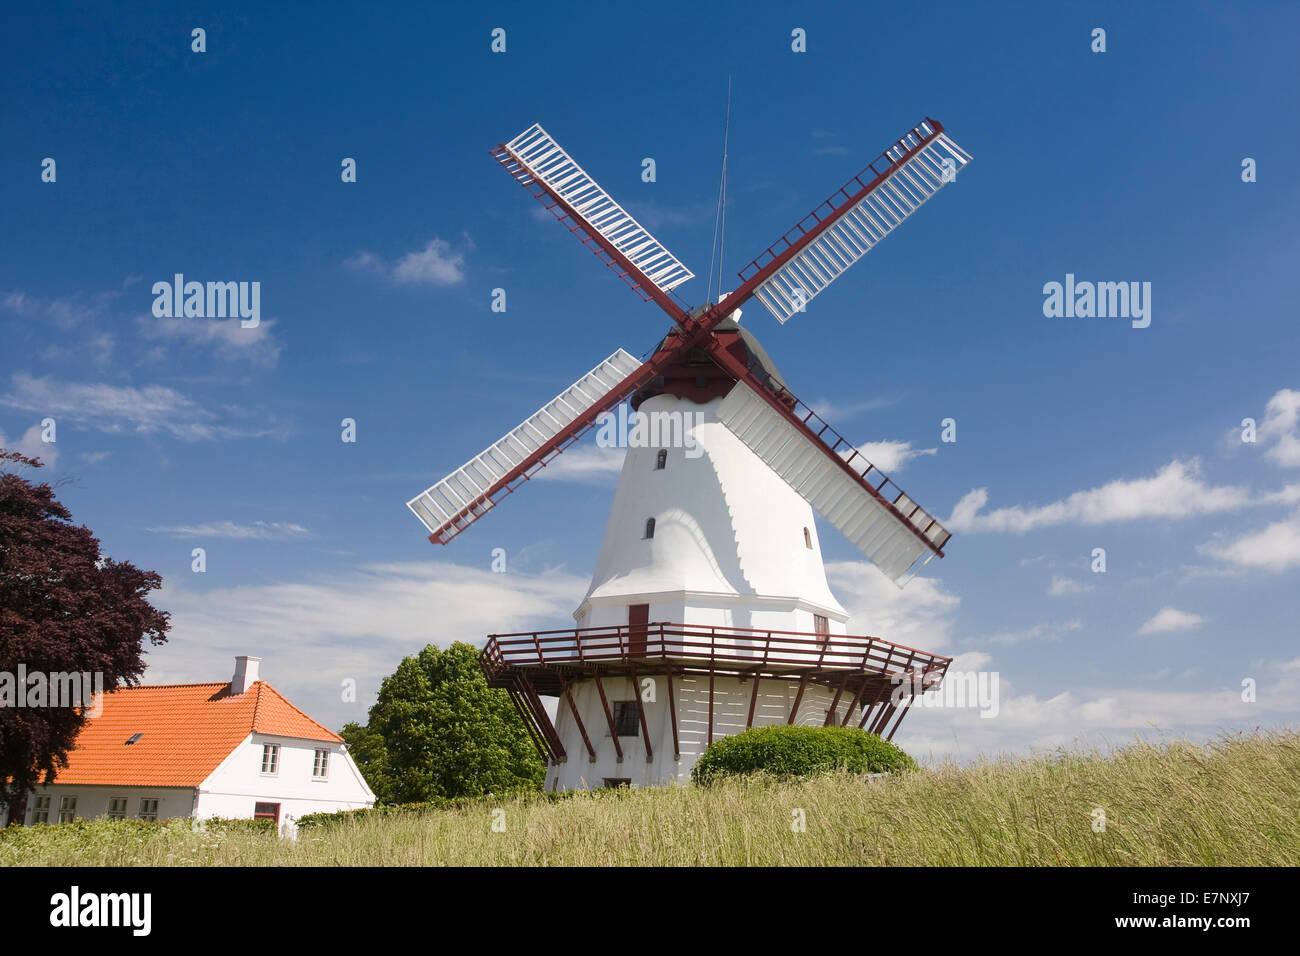 Building, Denmark, memorial, history, historically, museum, mill, Northern Europe, Scandinavia, Sonderburg, windmill, - Stock Image